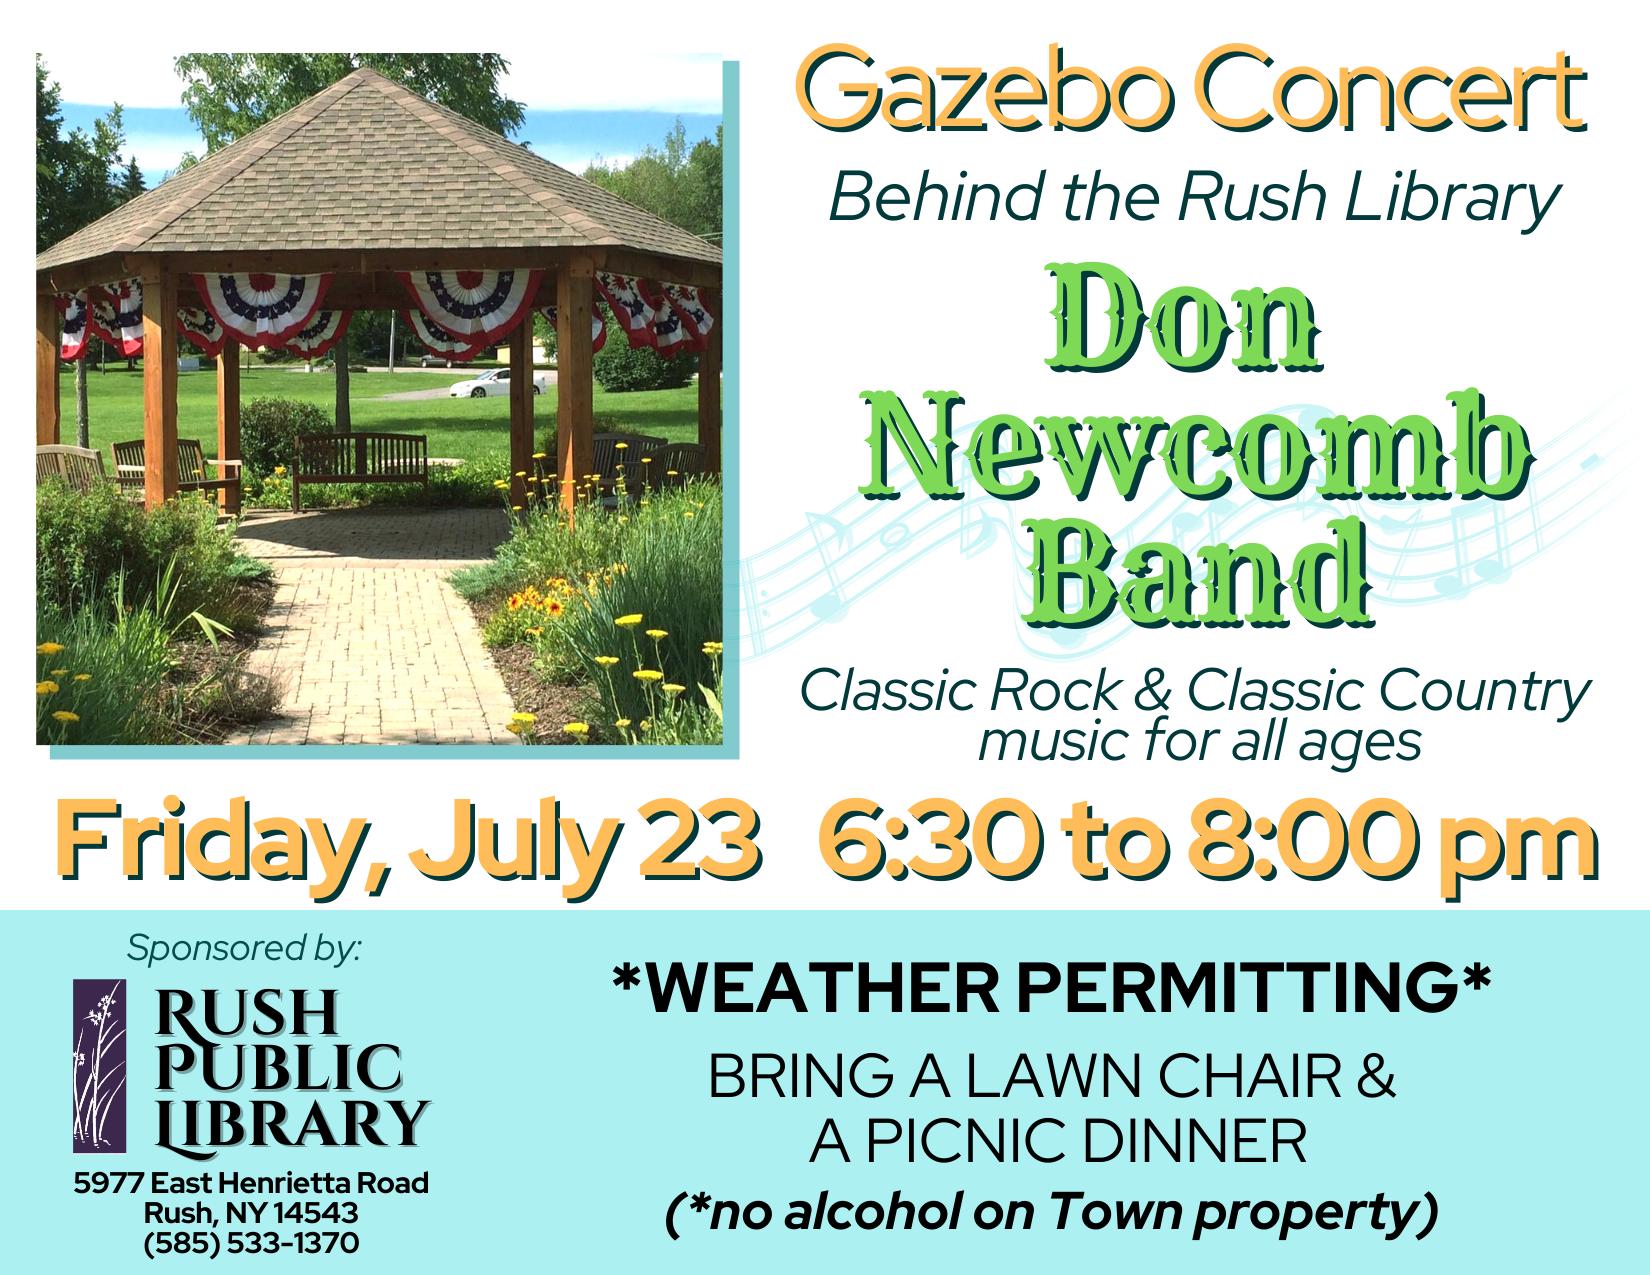 Gazebo Concert: Don Newcomb Band